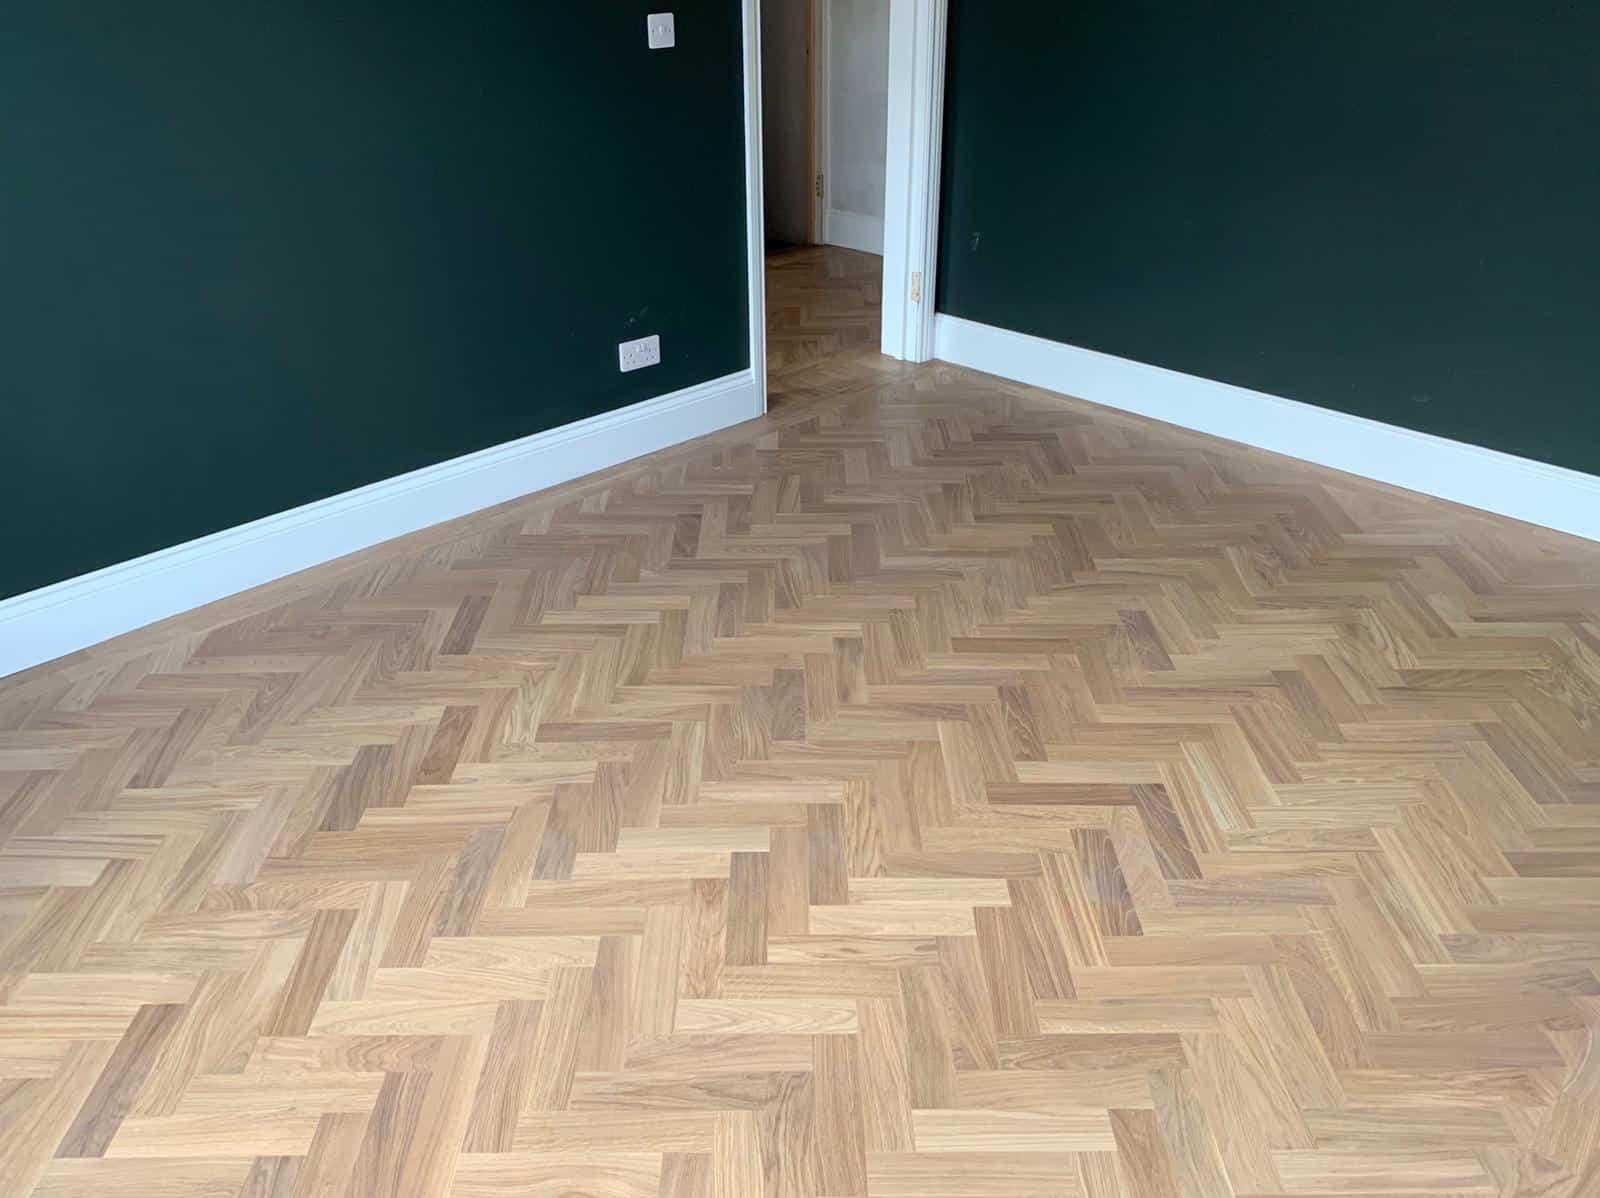 Bespoke Wood Flooring Sheffield Parquet Herringbone 2